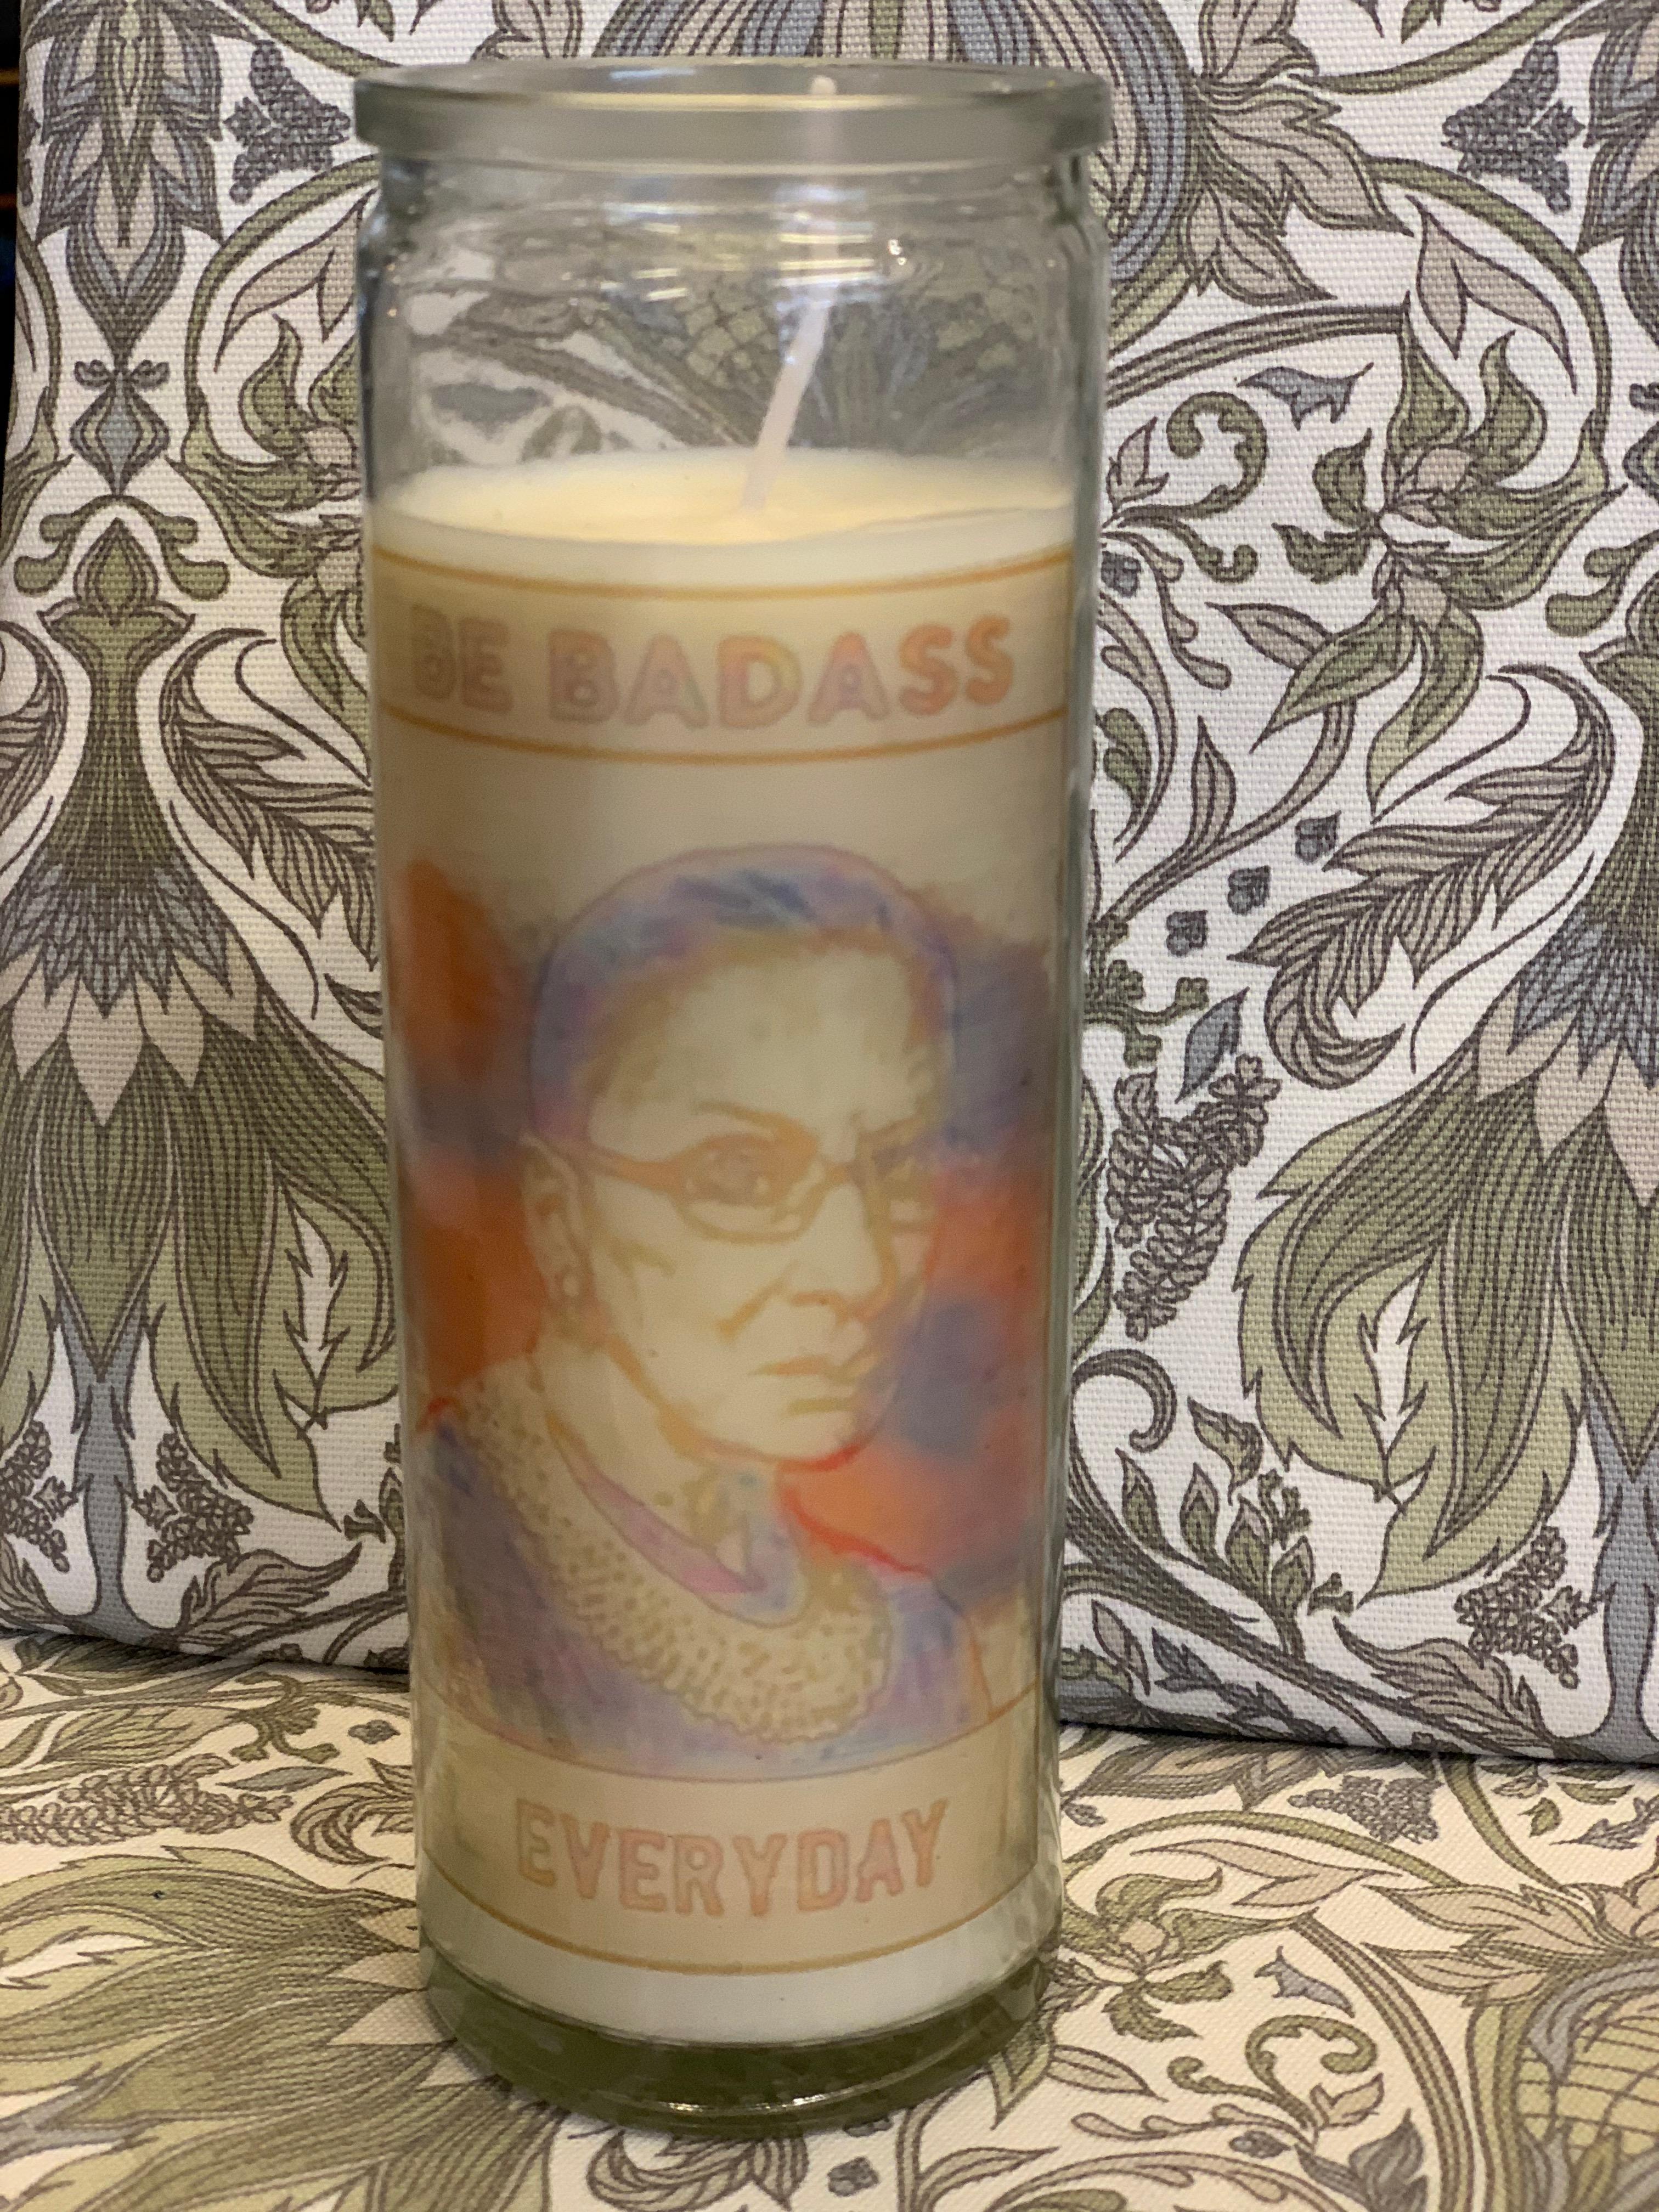 Ljus i Glas - Be Badass Everyday